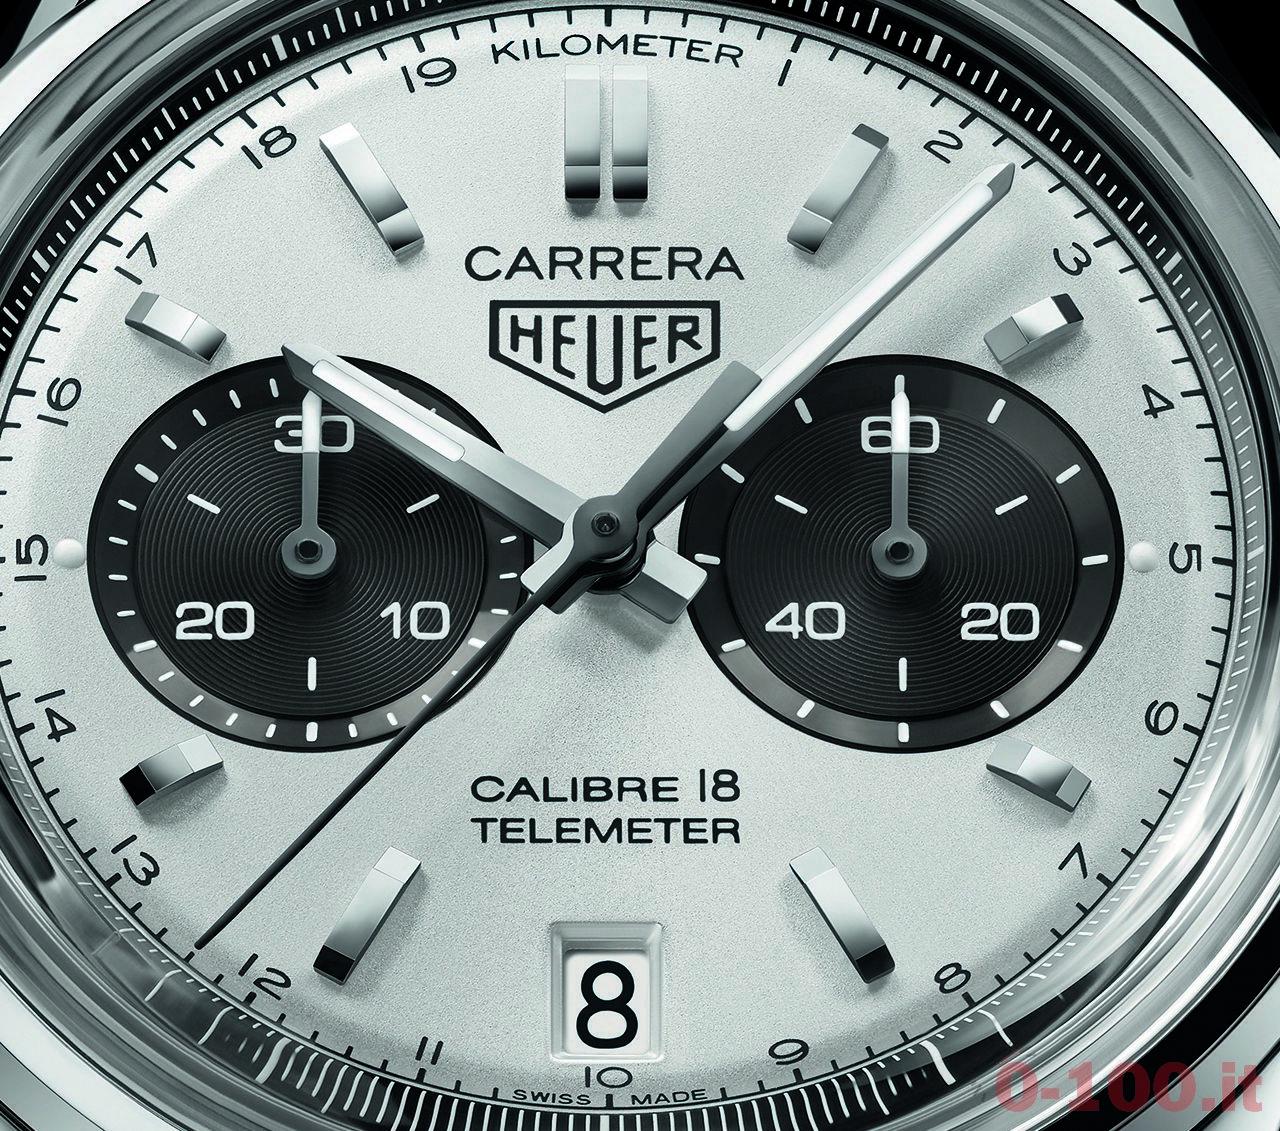 anteprima-baselworld-2015-tag-heuer-carrera-calibre-18-chronograph_0-100_2